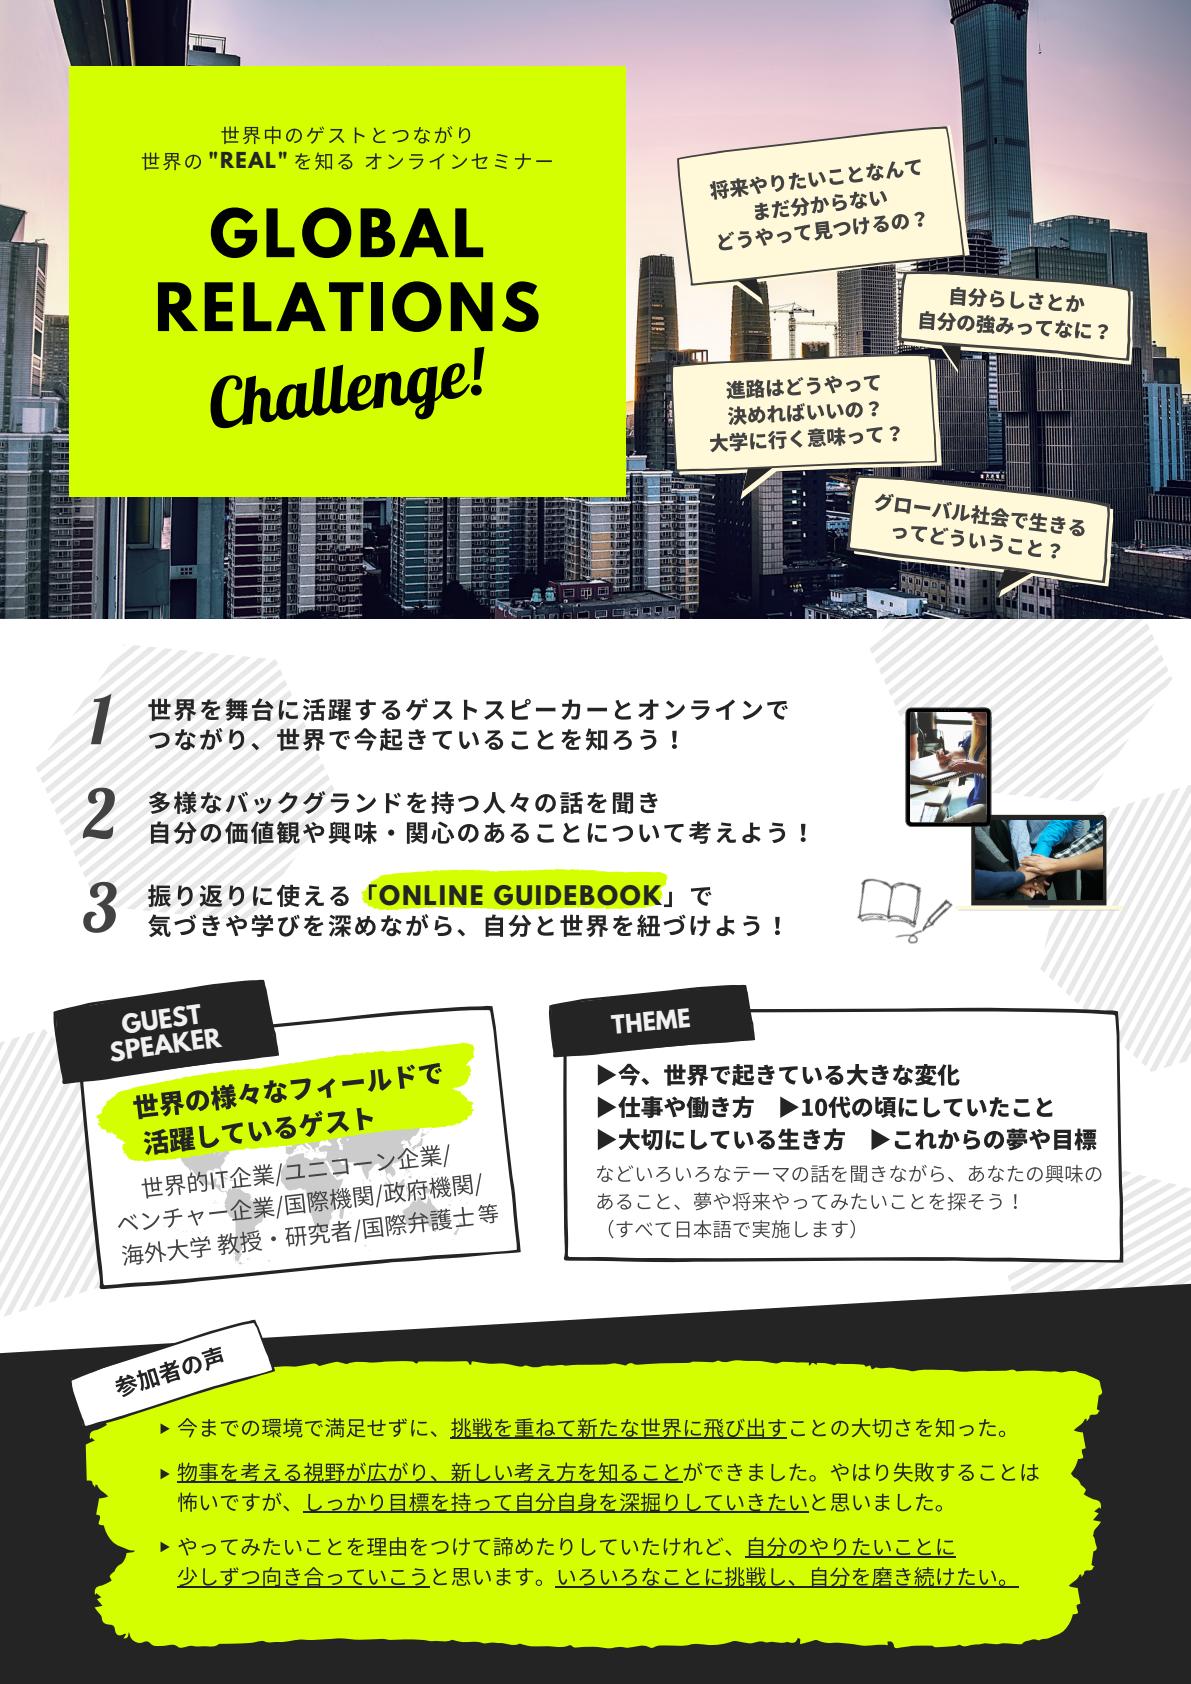 Global Relations Challenge